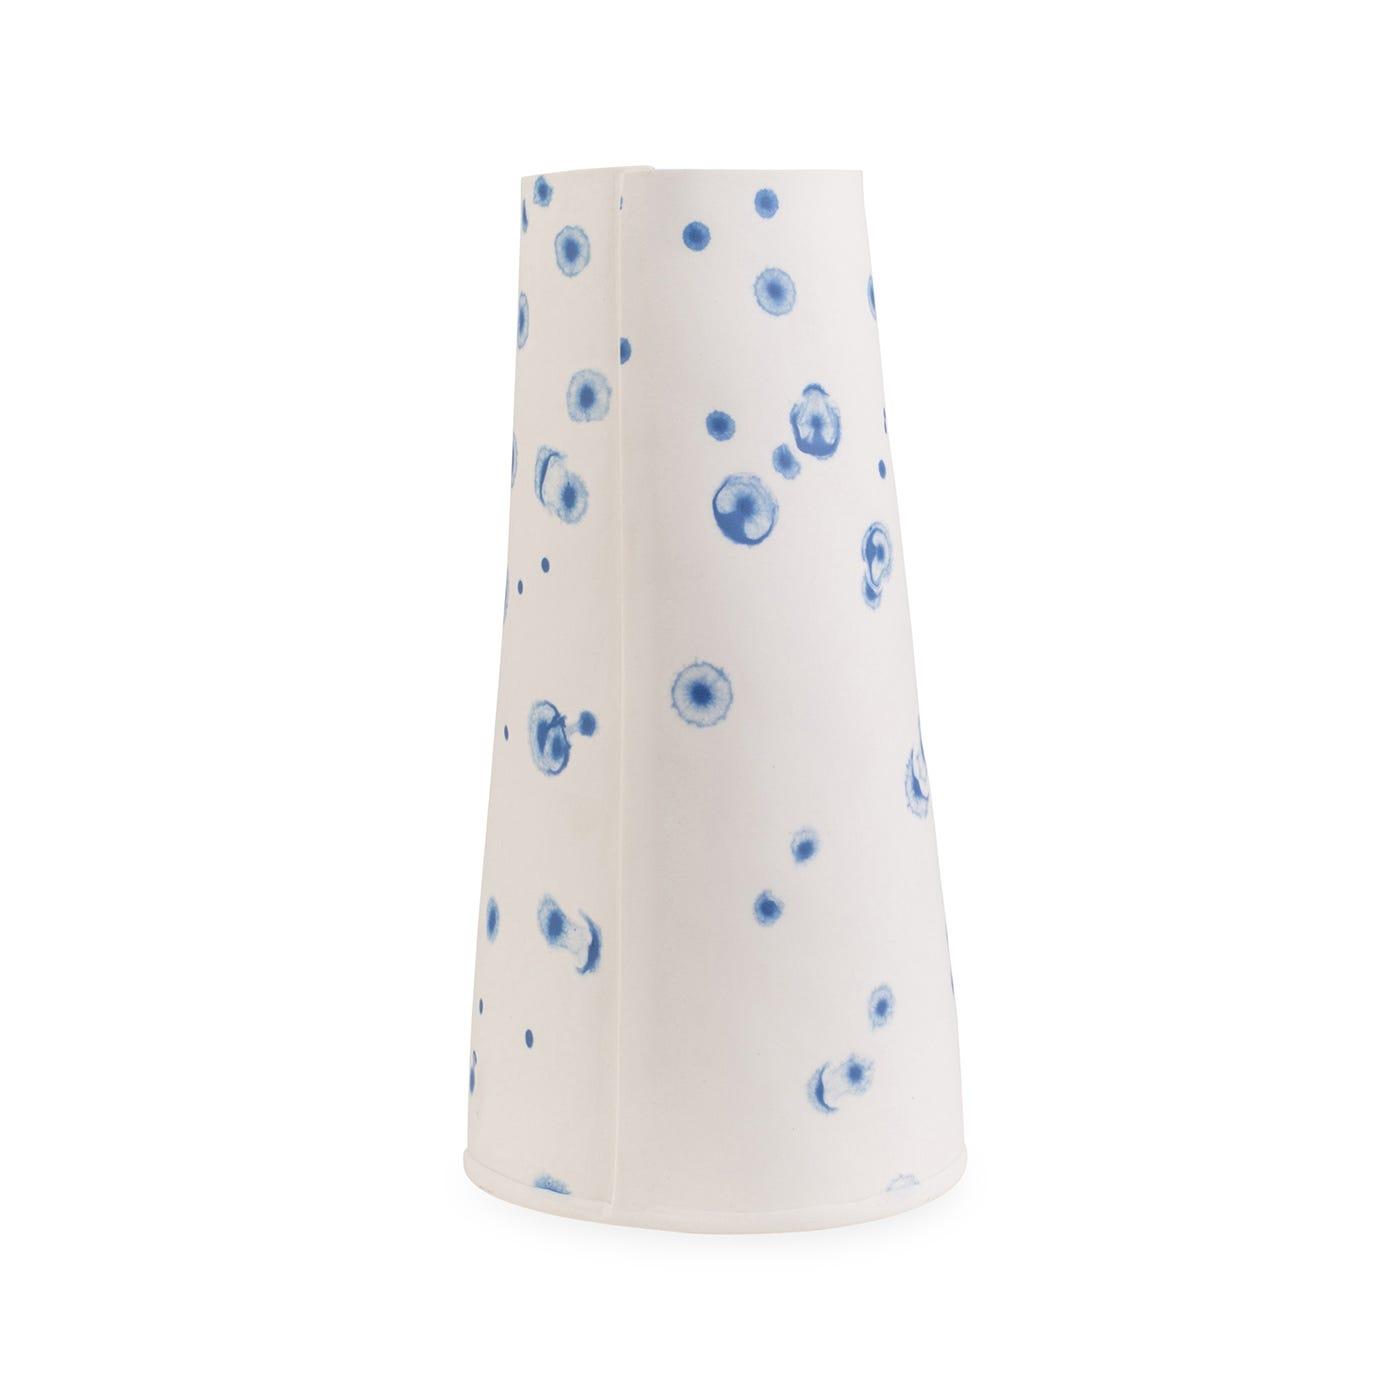 Taper Vase Decorex Blue Ink Spot Large